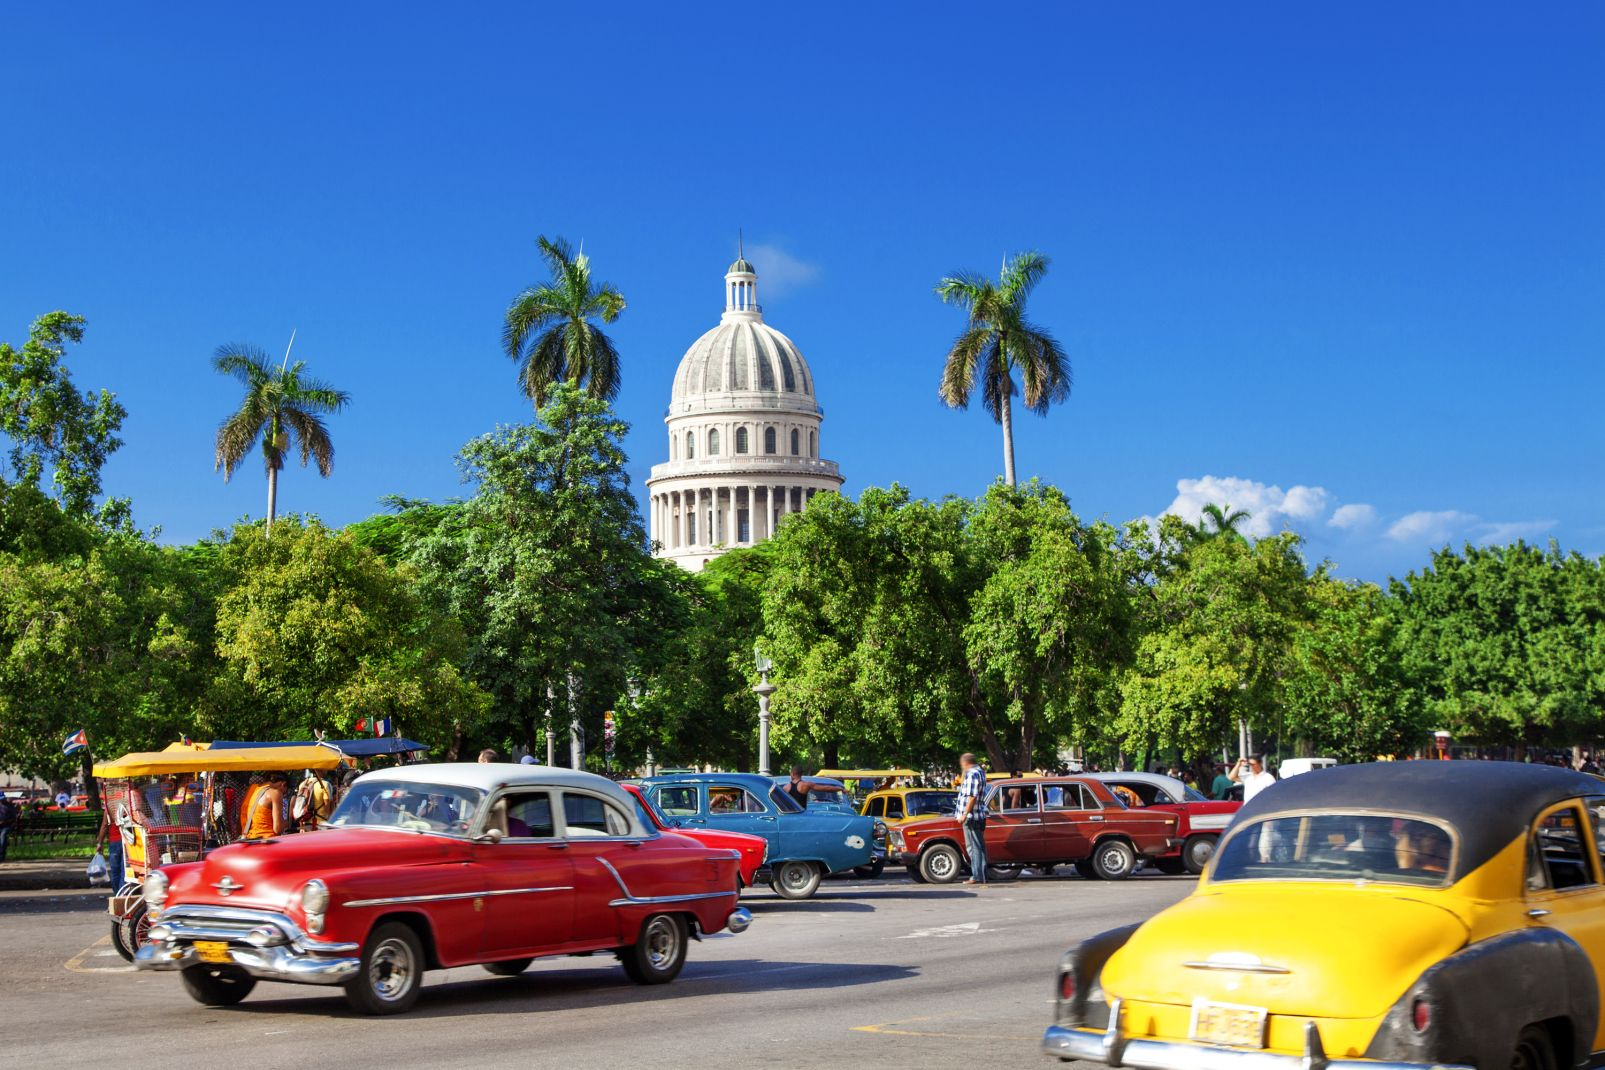 Washington svuota l'ambasciata Usa a Cuba